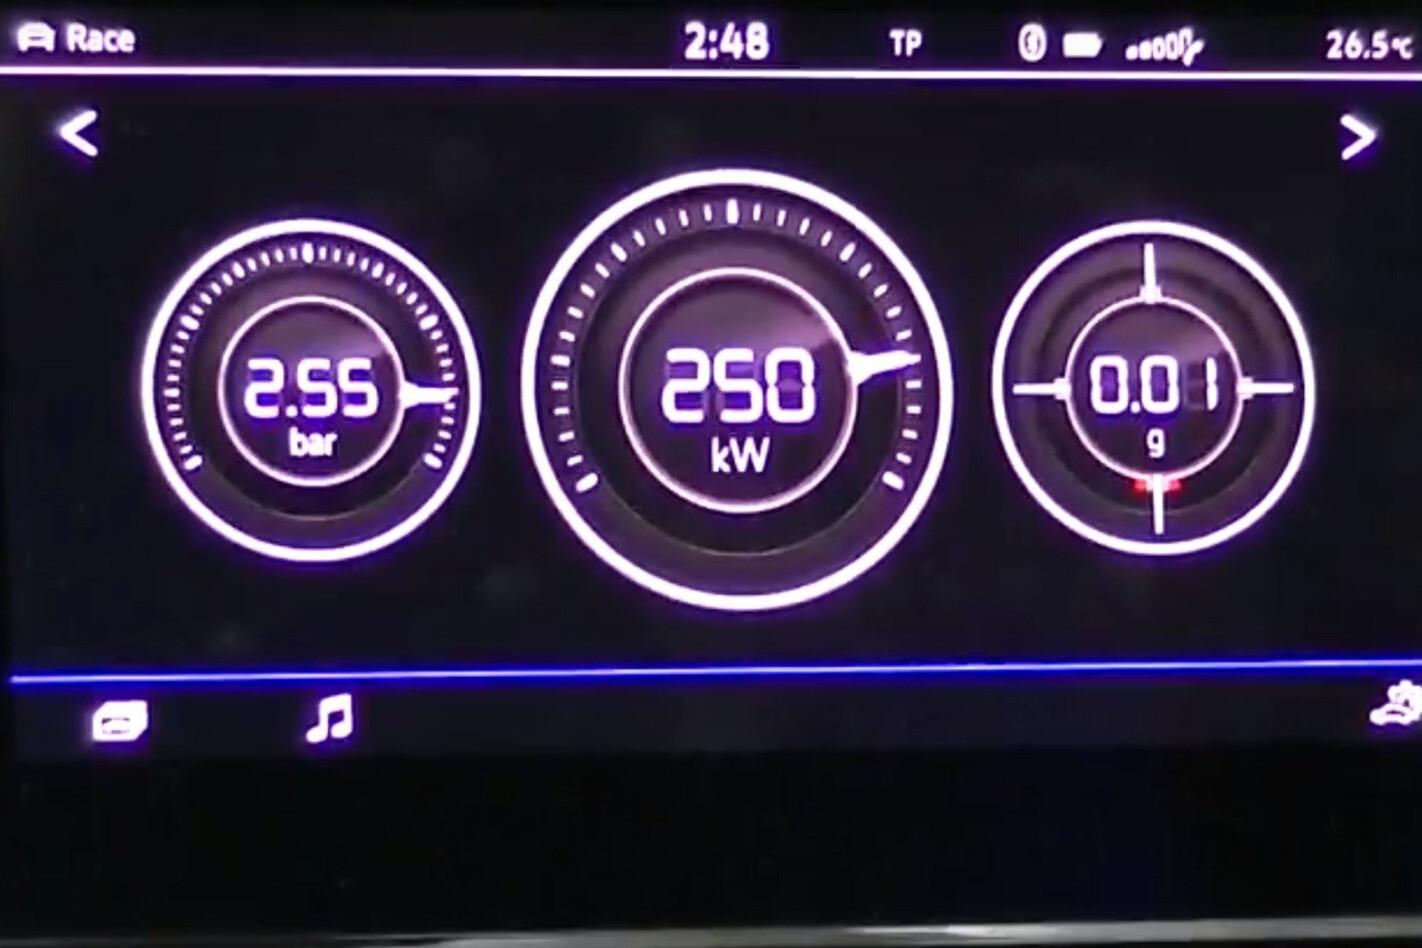 2018 Volkswagen Golf R 7.5 performance gauges